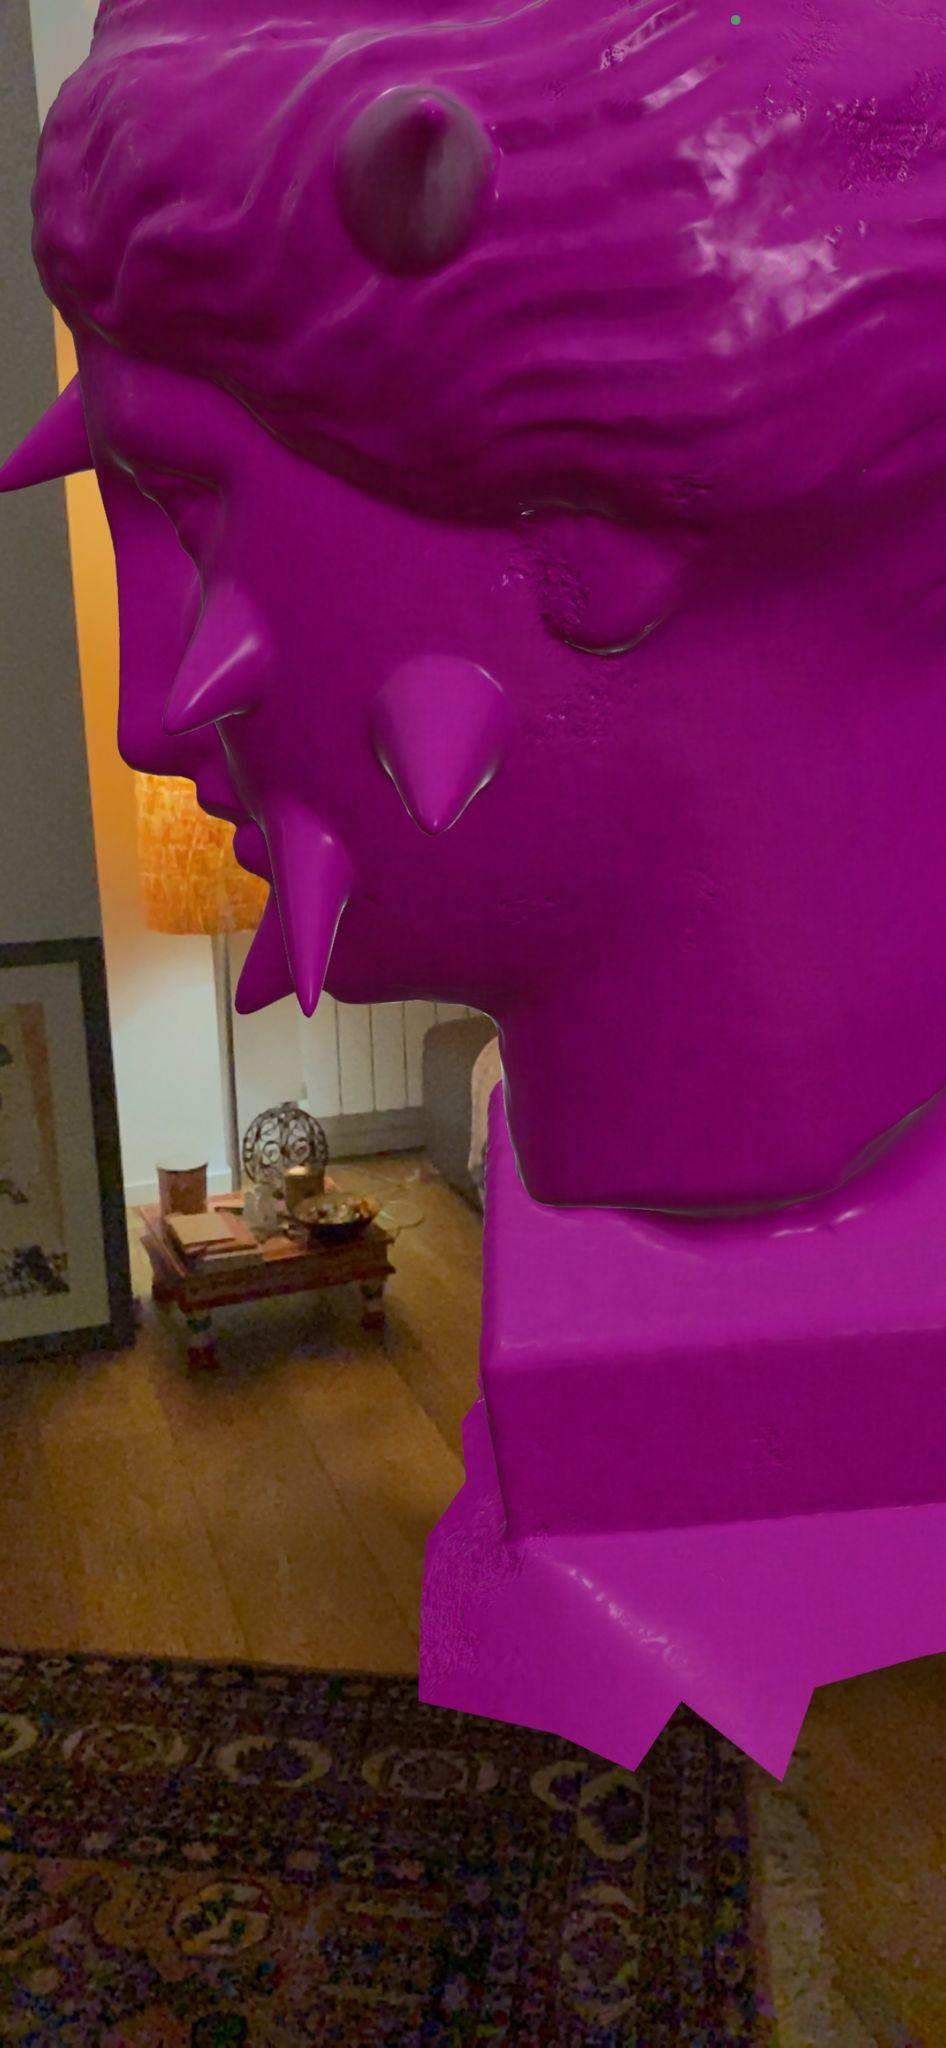 Pink Venus Virtual Sculpture by Francesca Fini